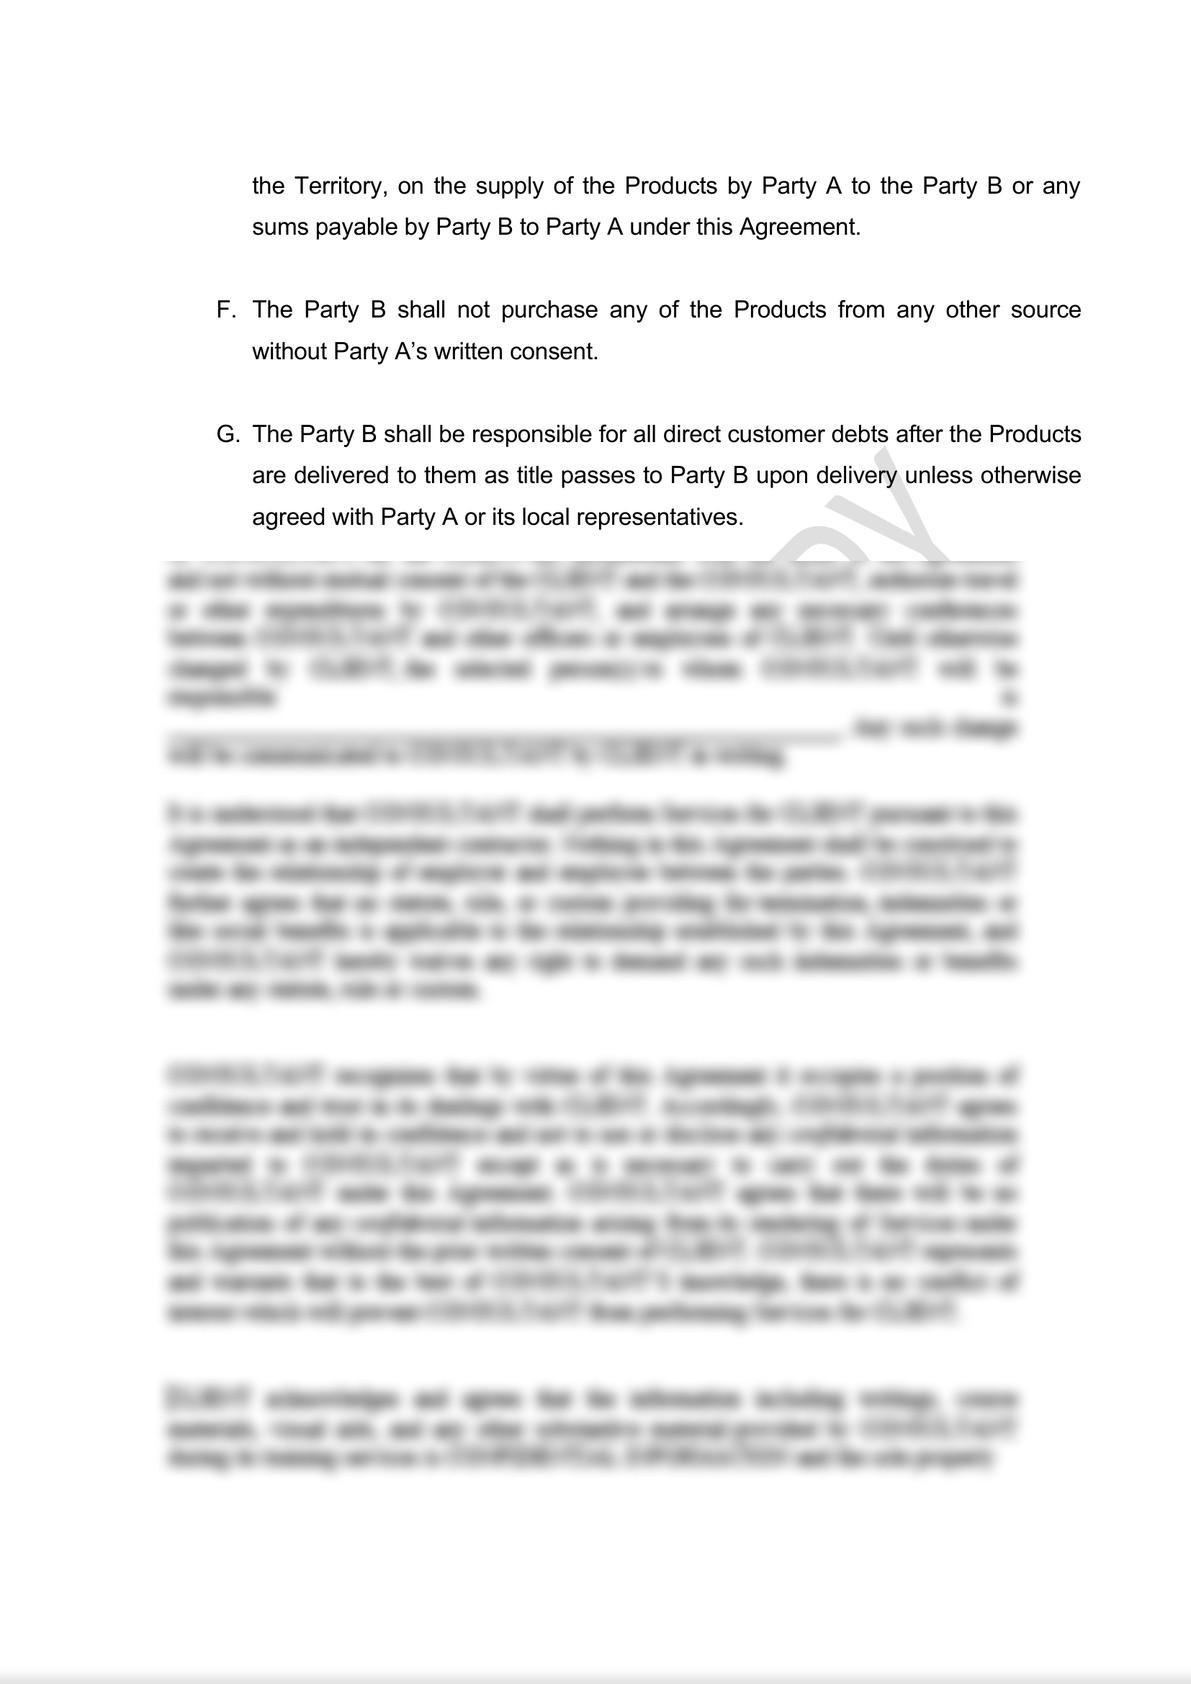 Distribution Agreement Draft (iii)-4